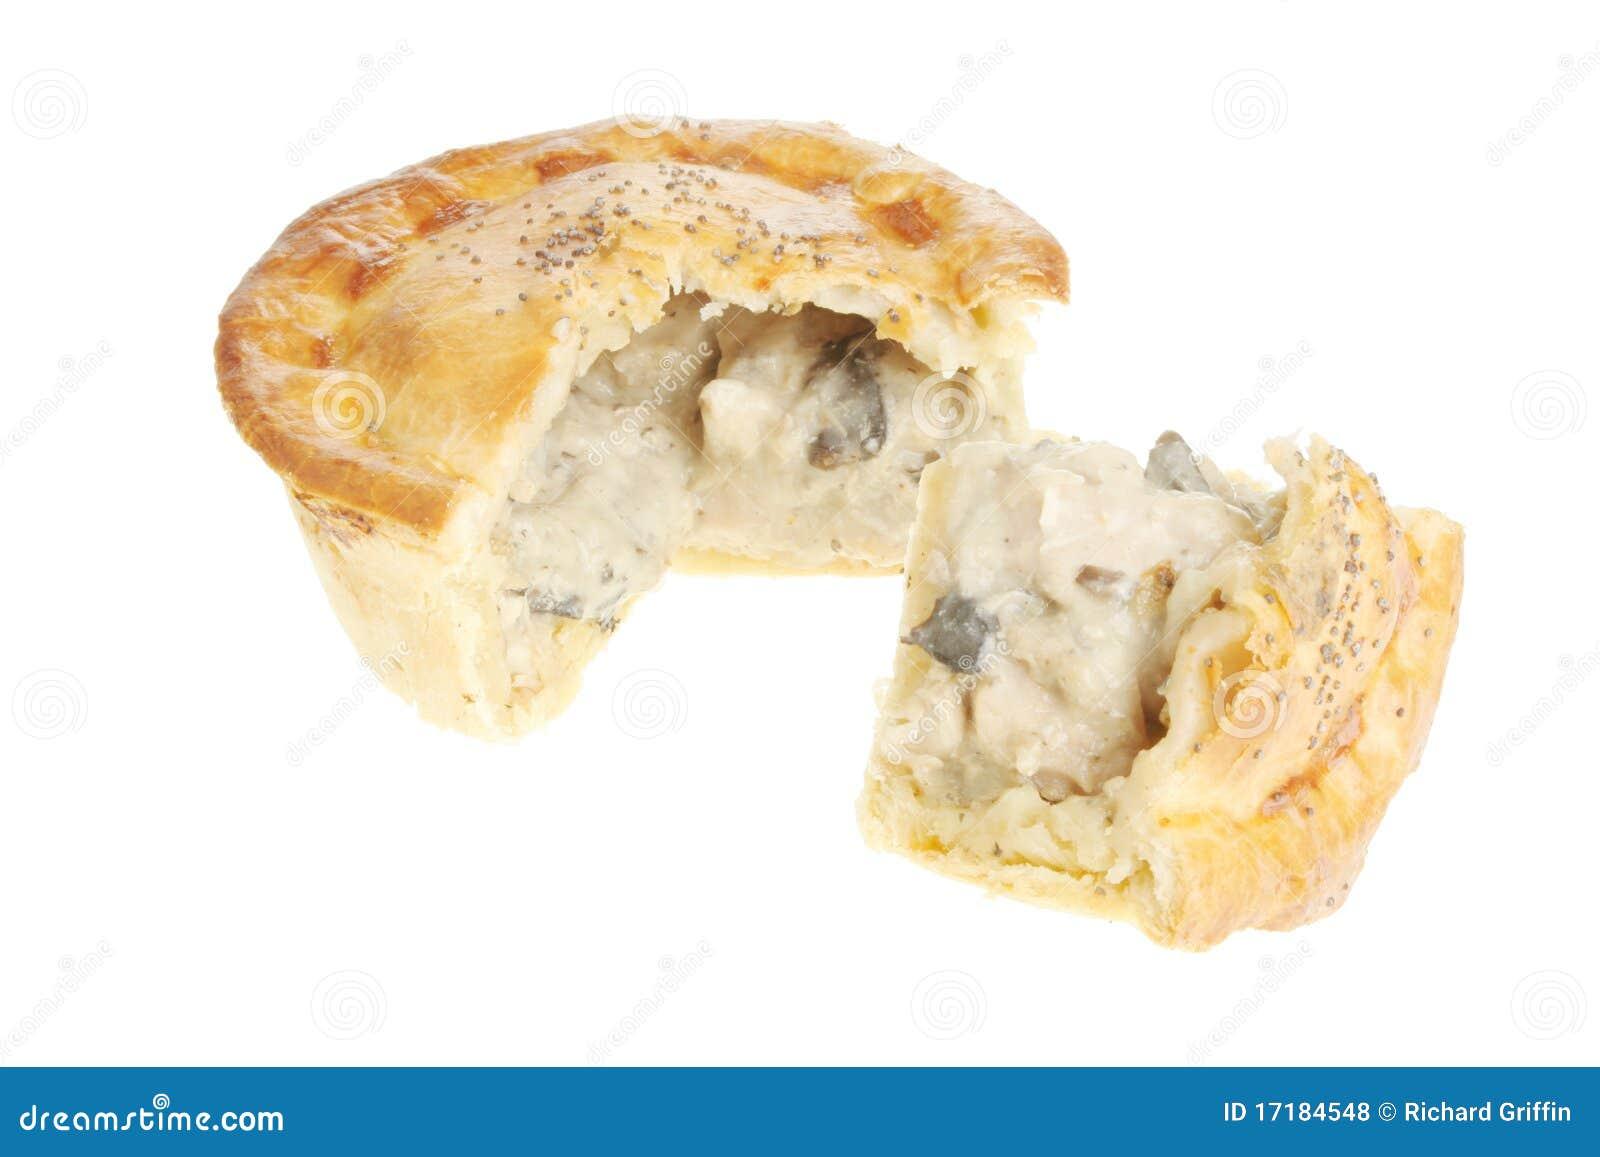 Chicken And Mushroom Pie Royalty Free Stock Photos - Image: 17184548